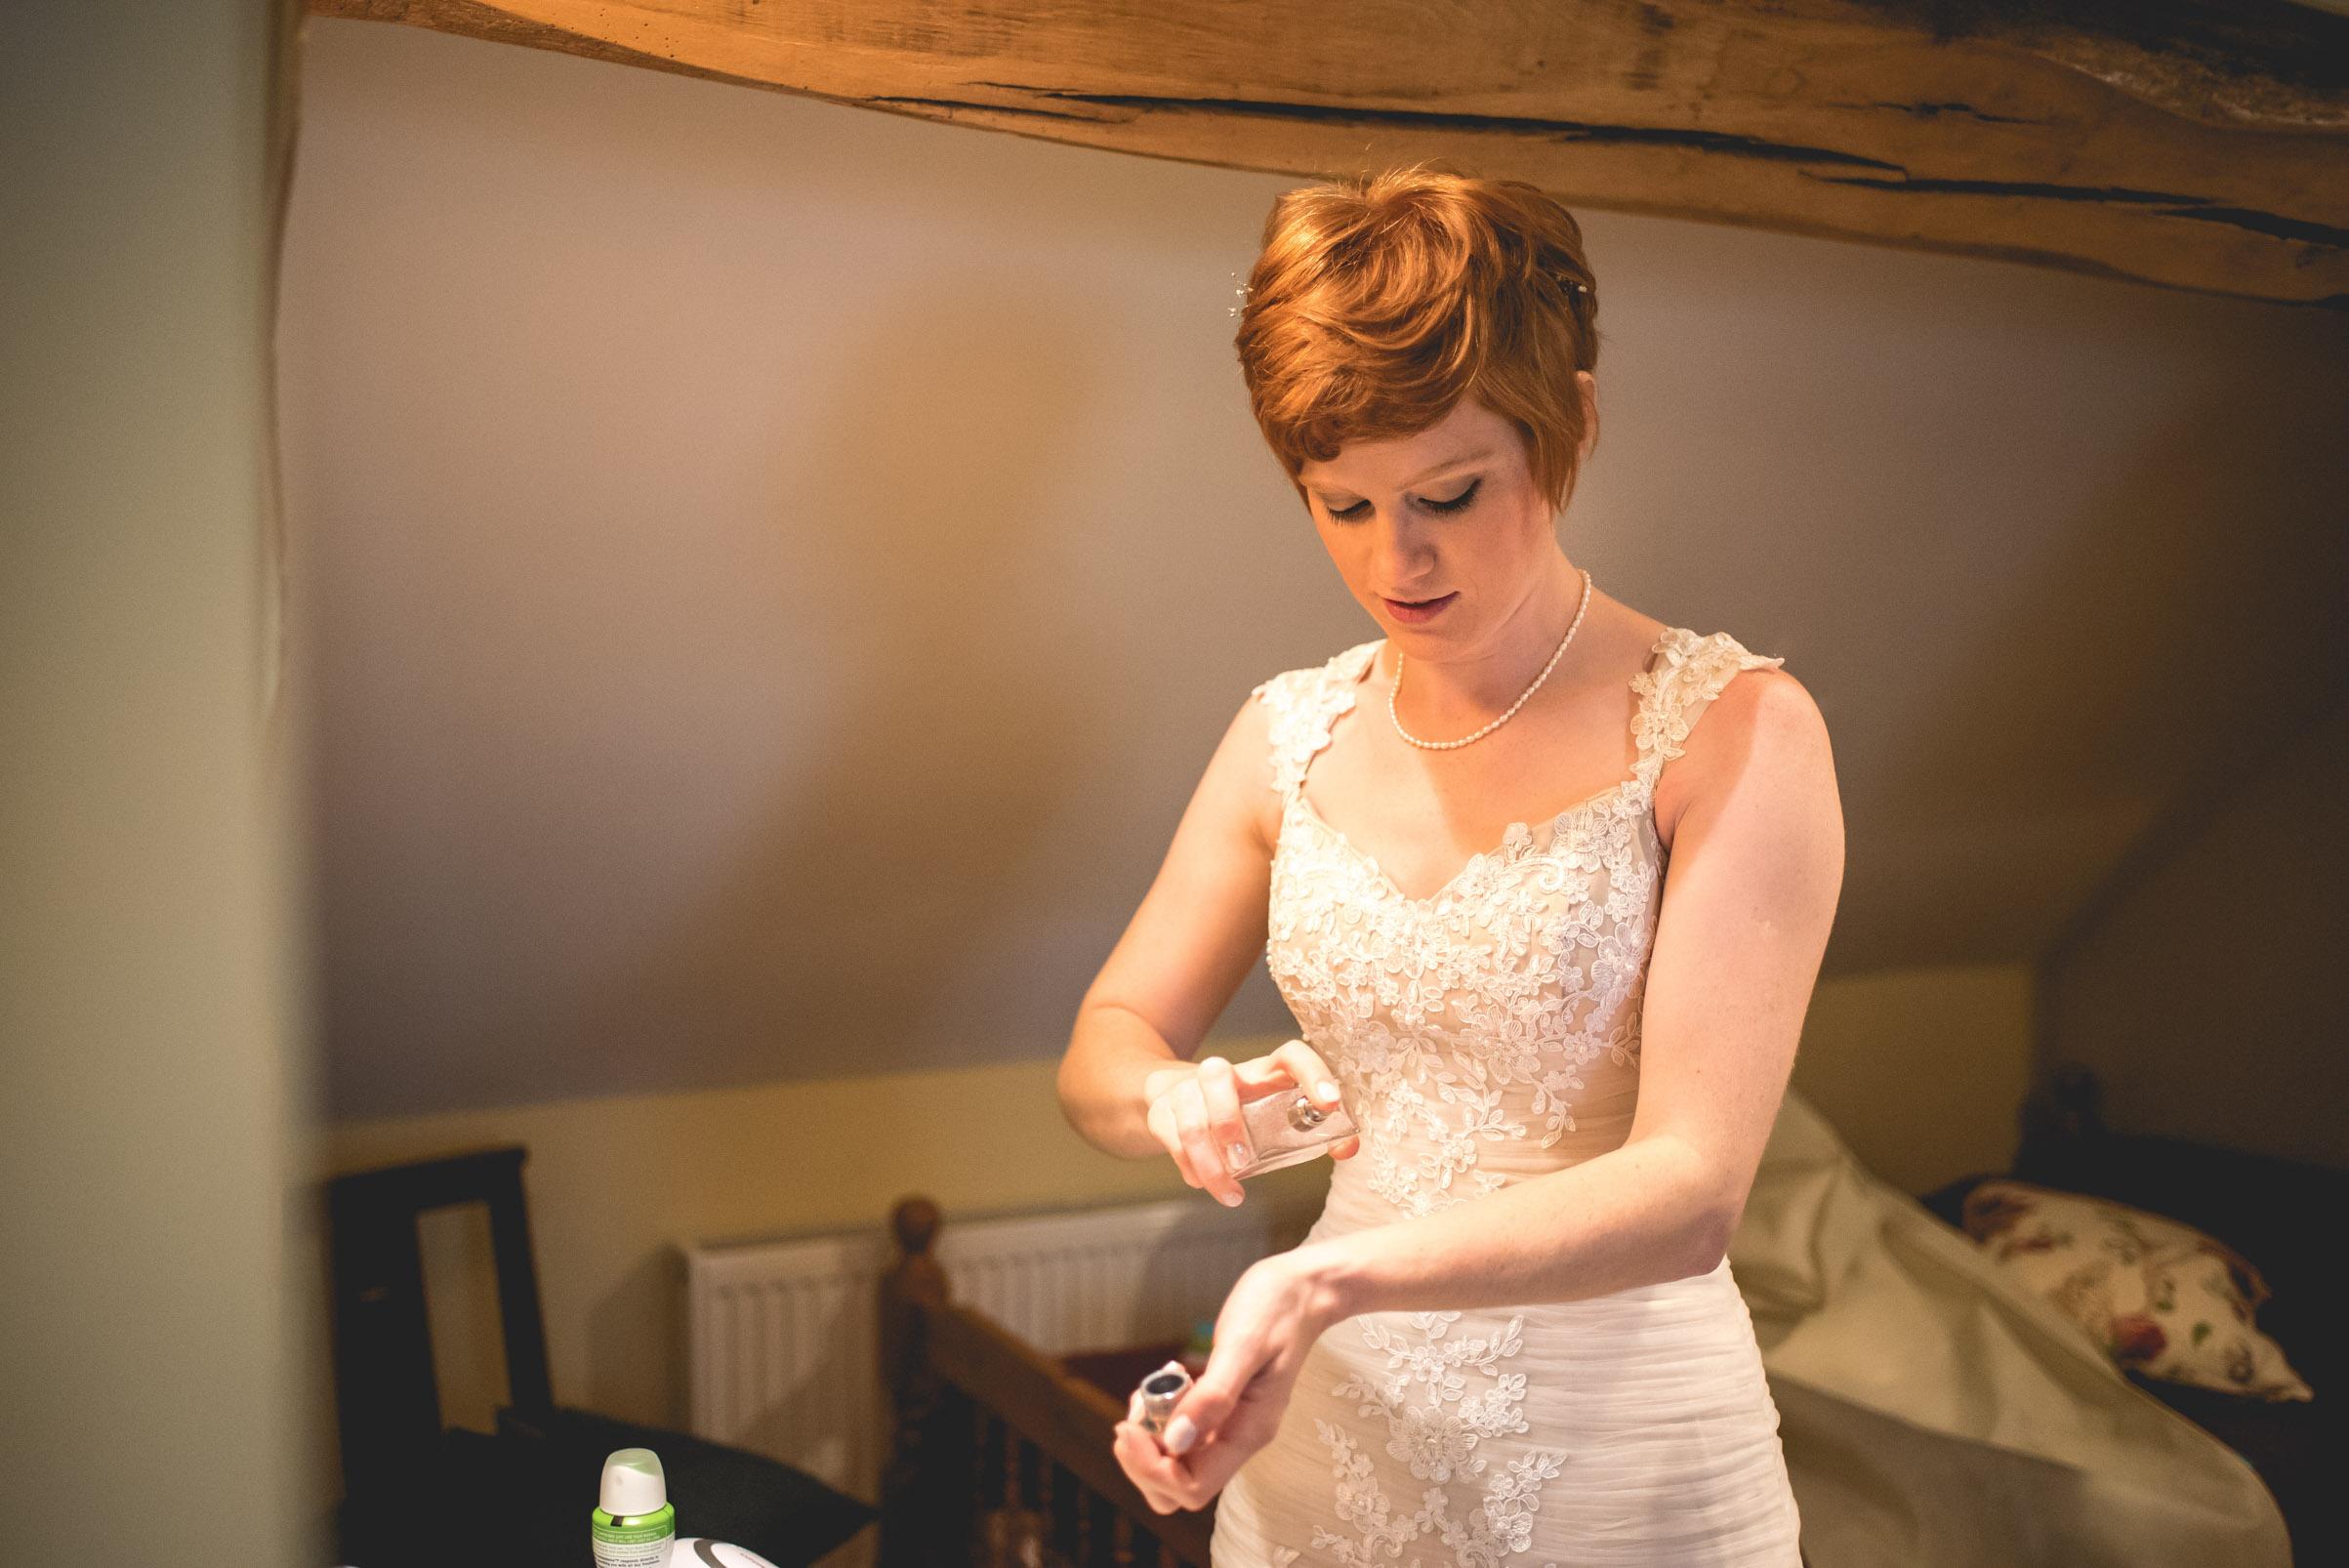 Peak+district+farm+wedding+lower+damgate+photographer-64.jpg